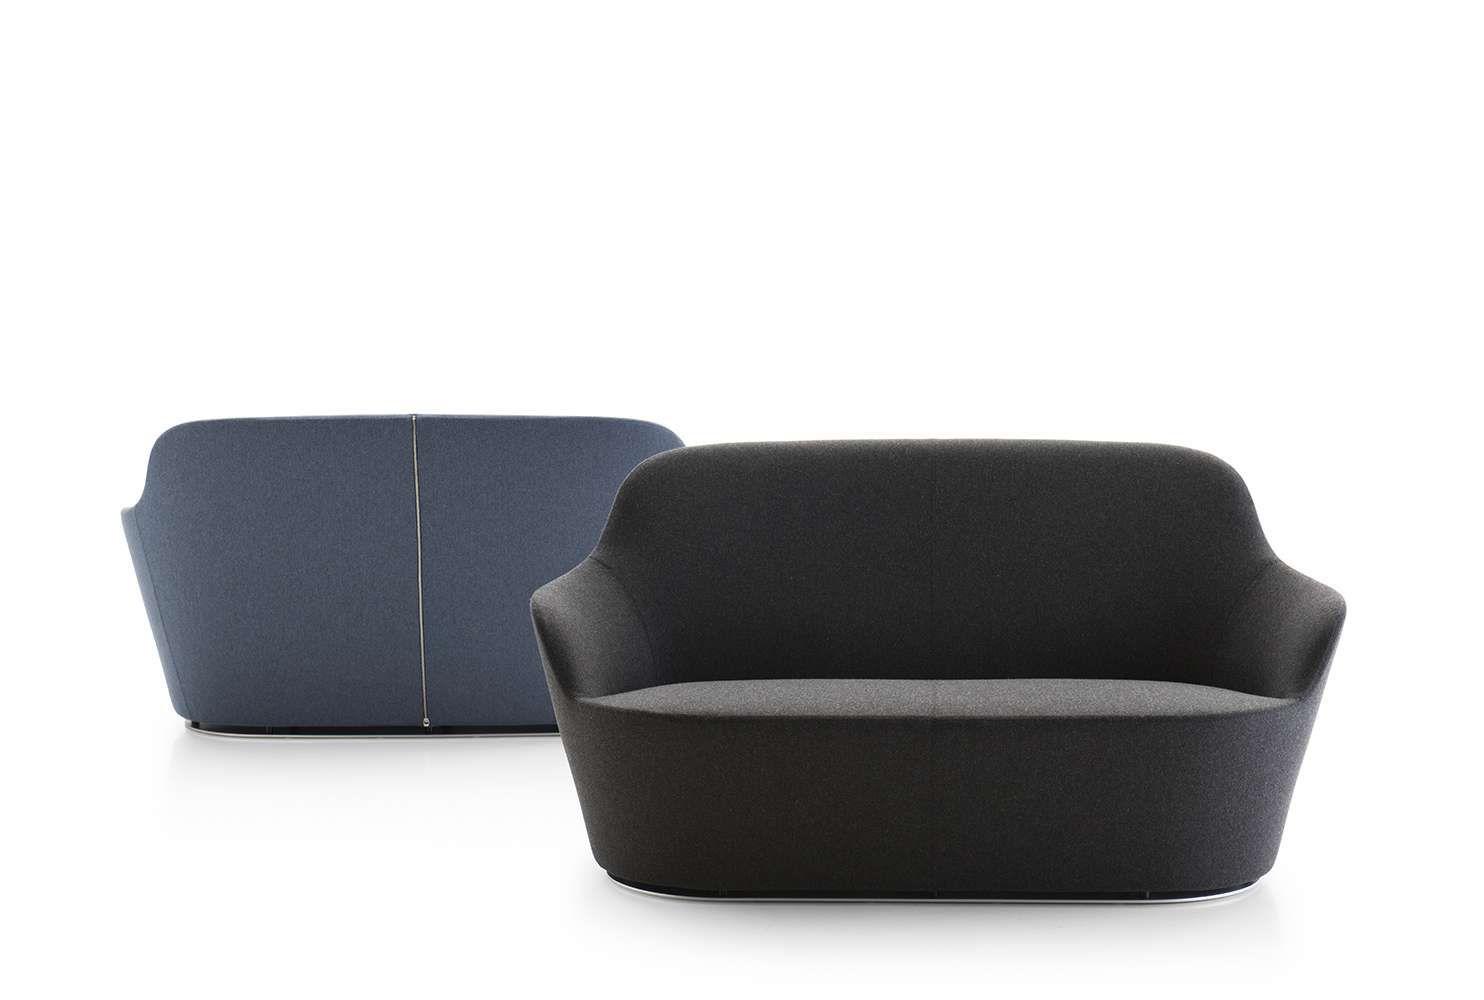 sofa harbor b b italia design by naoto fukasawa furniture rh pinterest com